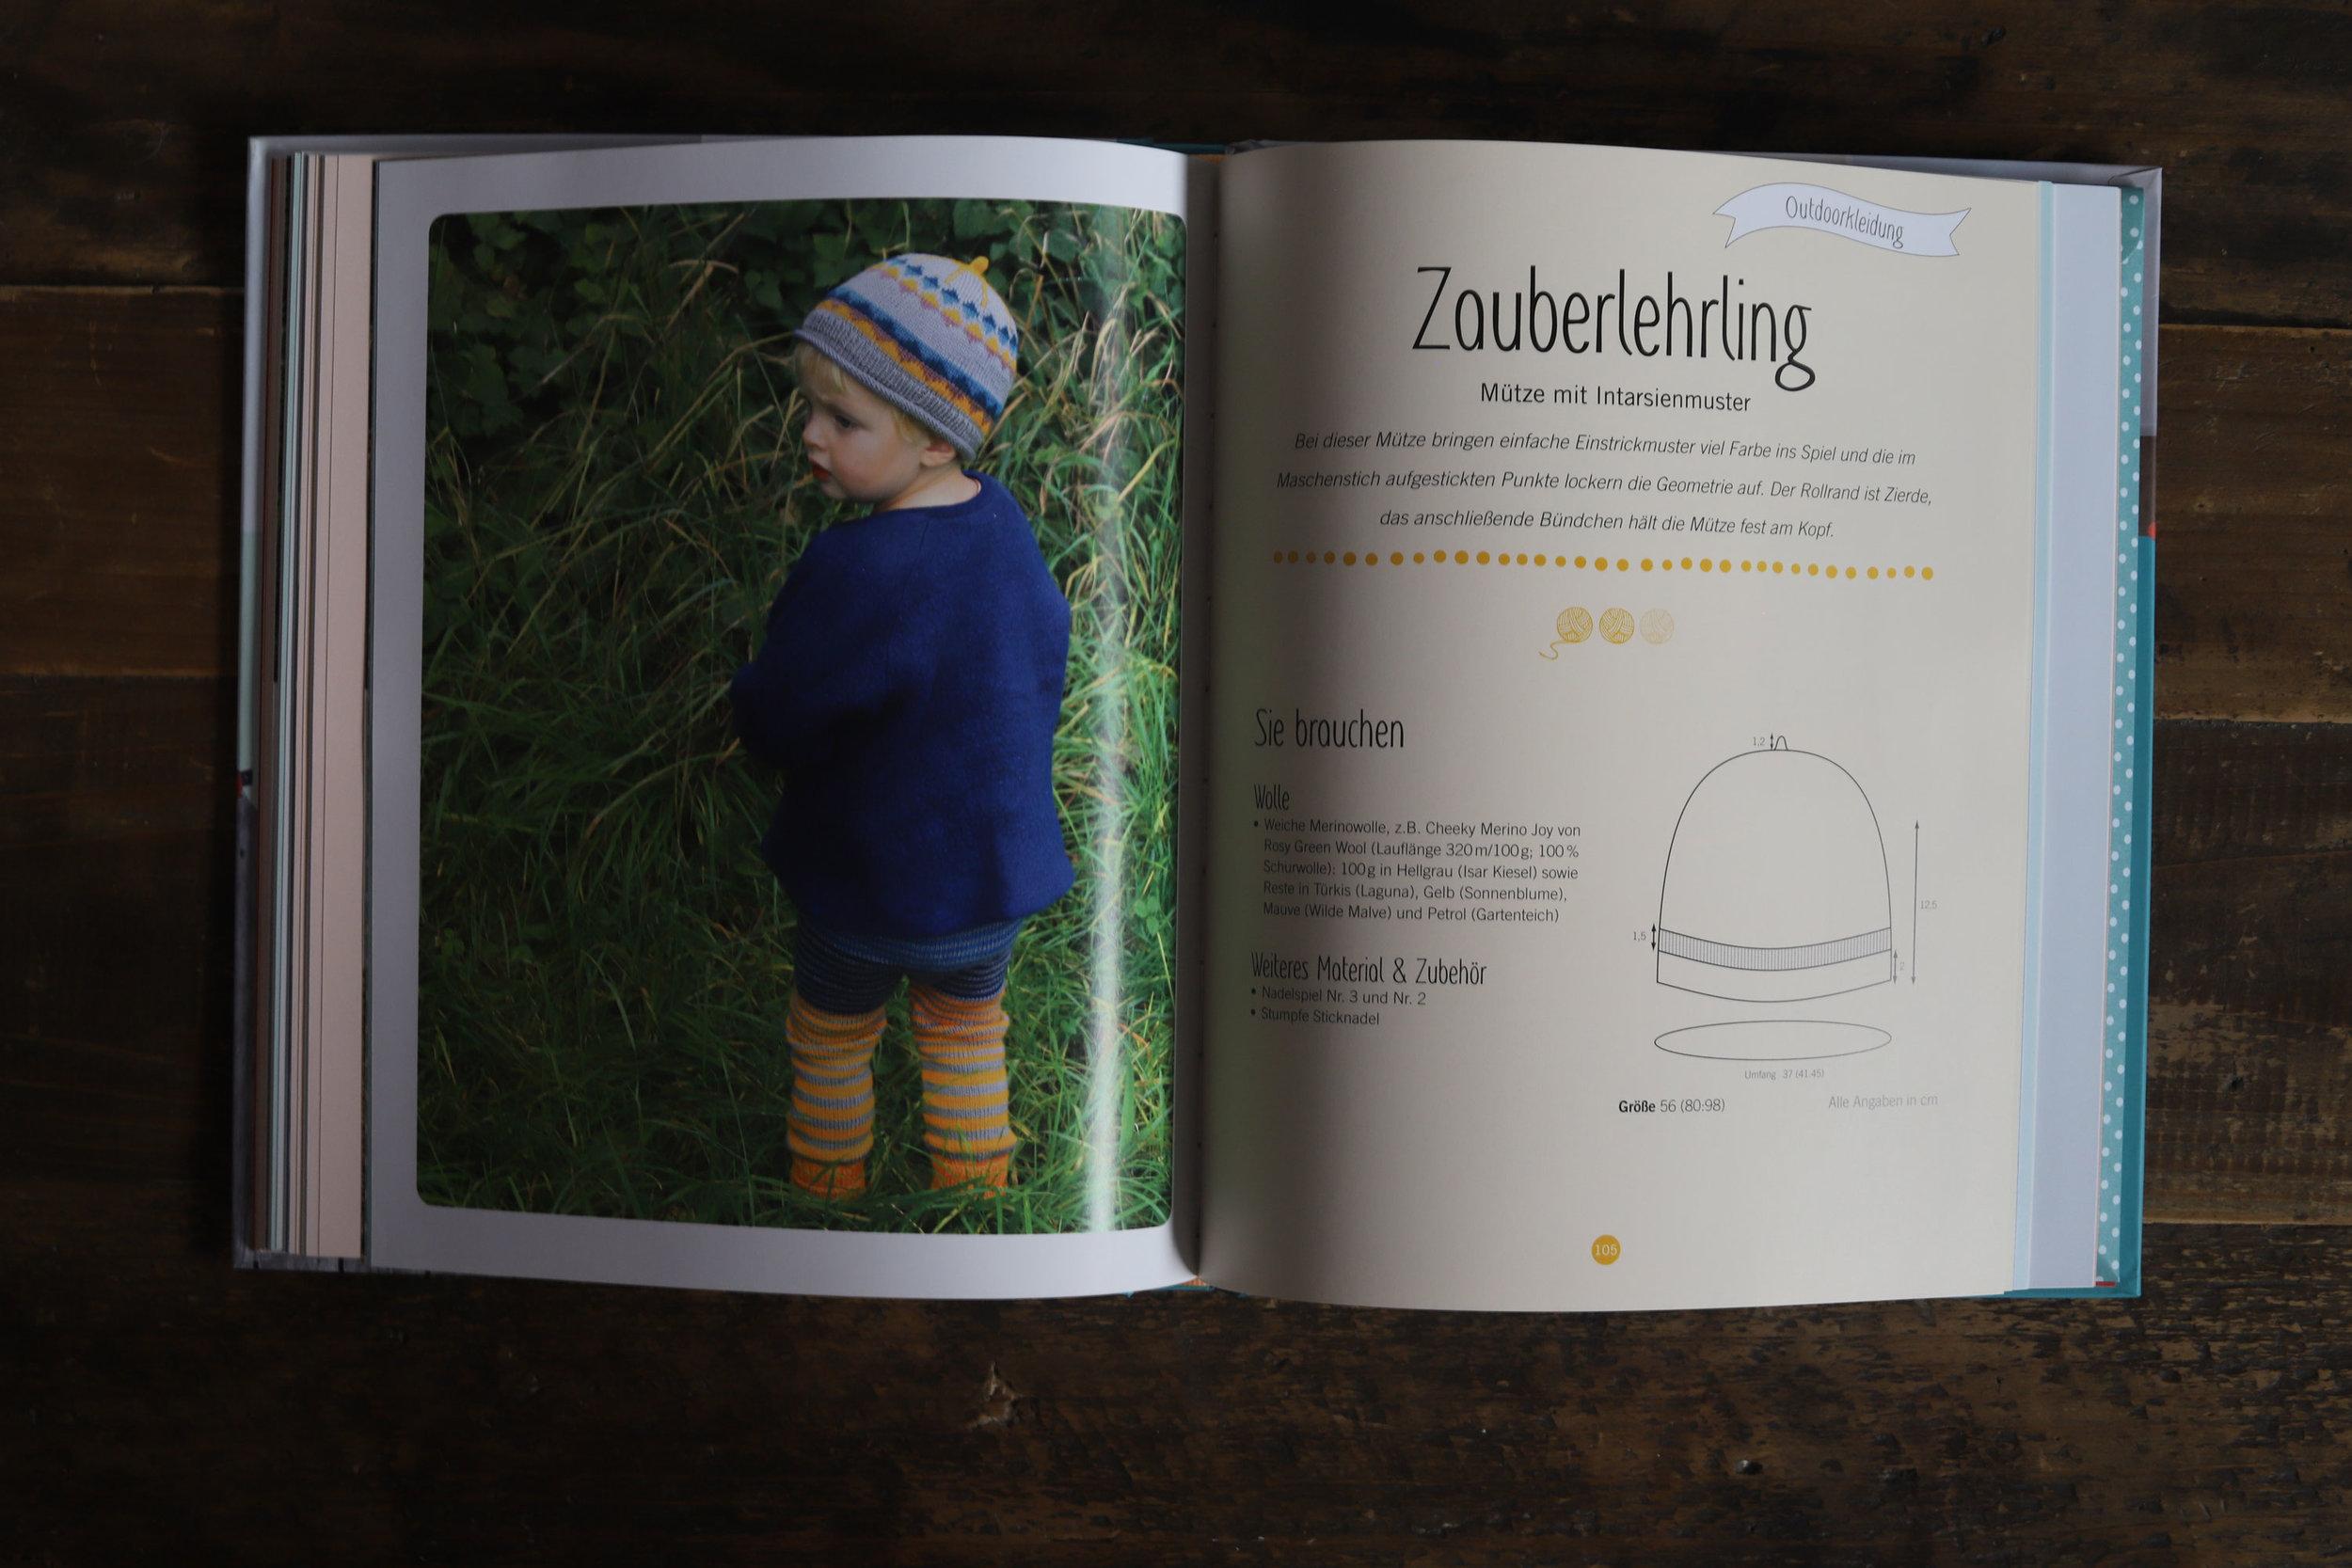 esther-meinl-zottl-produktfotografie-14.jpg